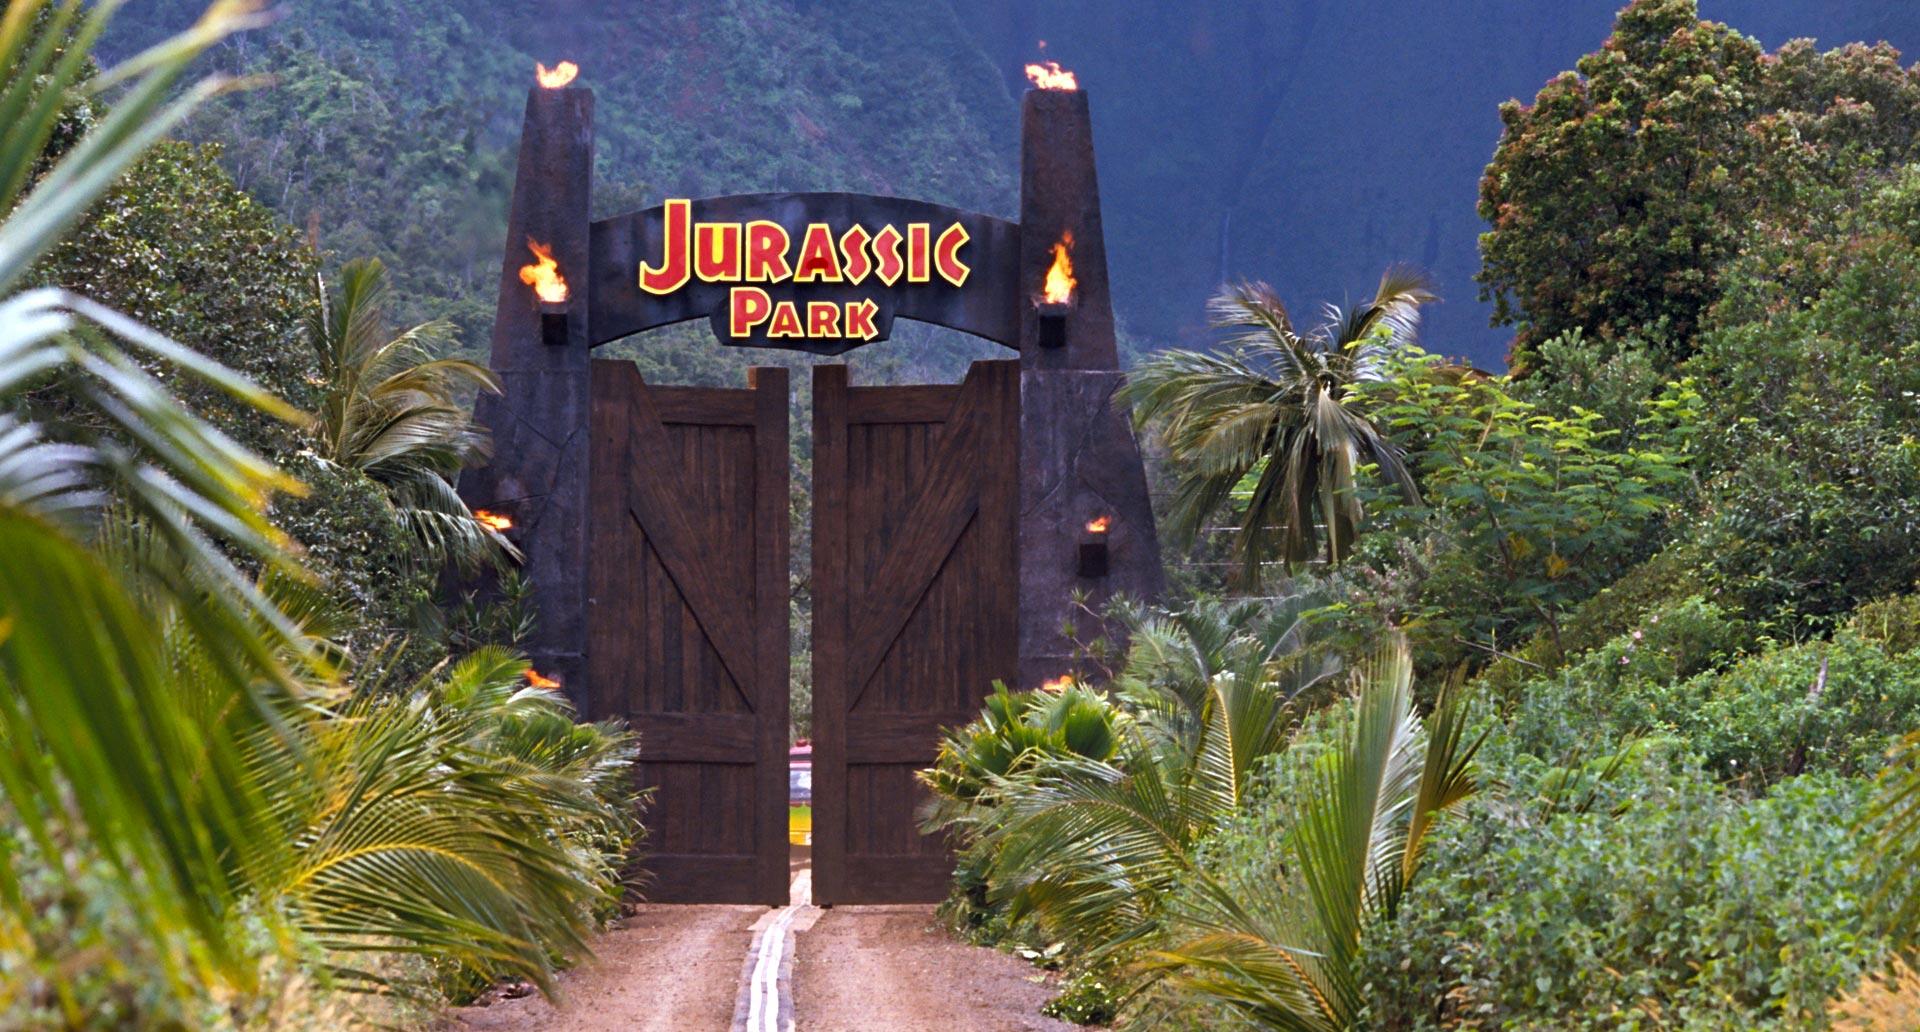 Jurassic Park kapuja.jpg